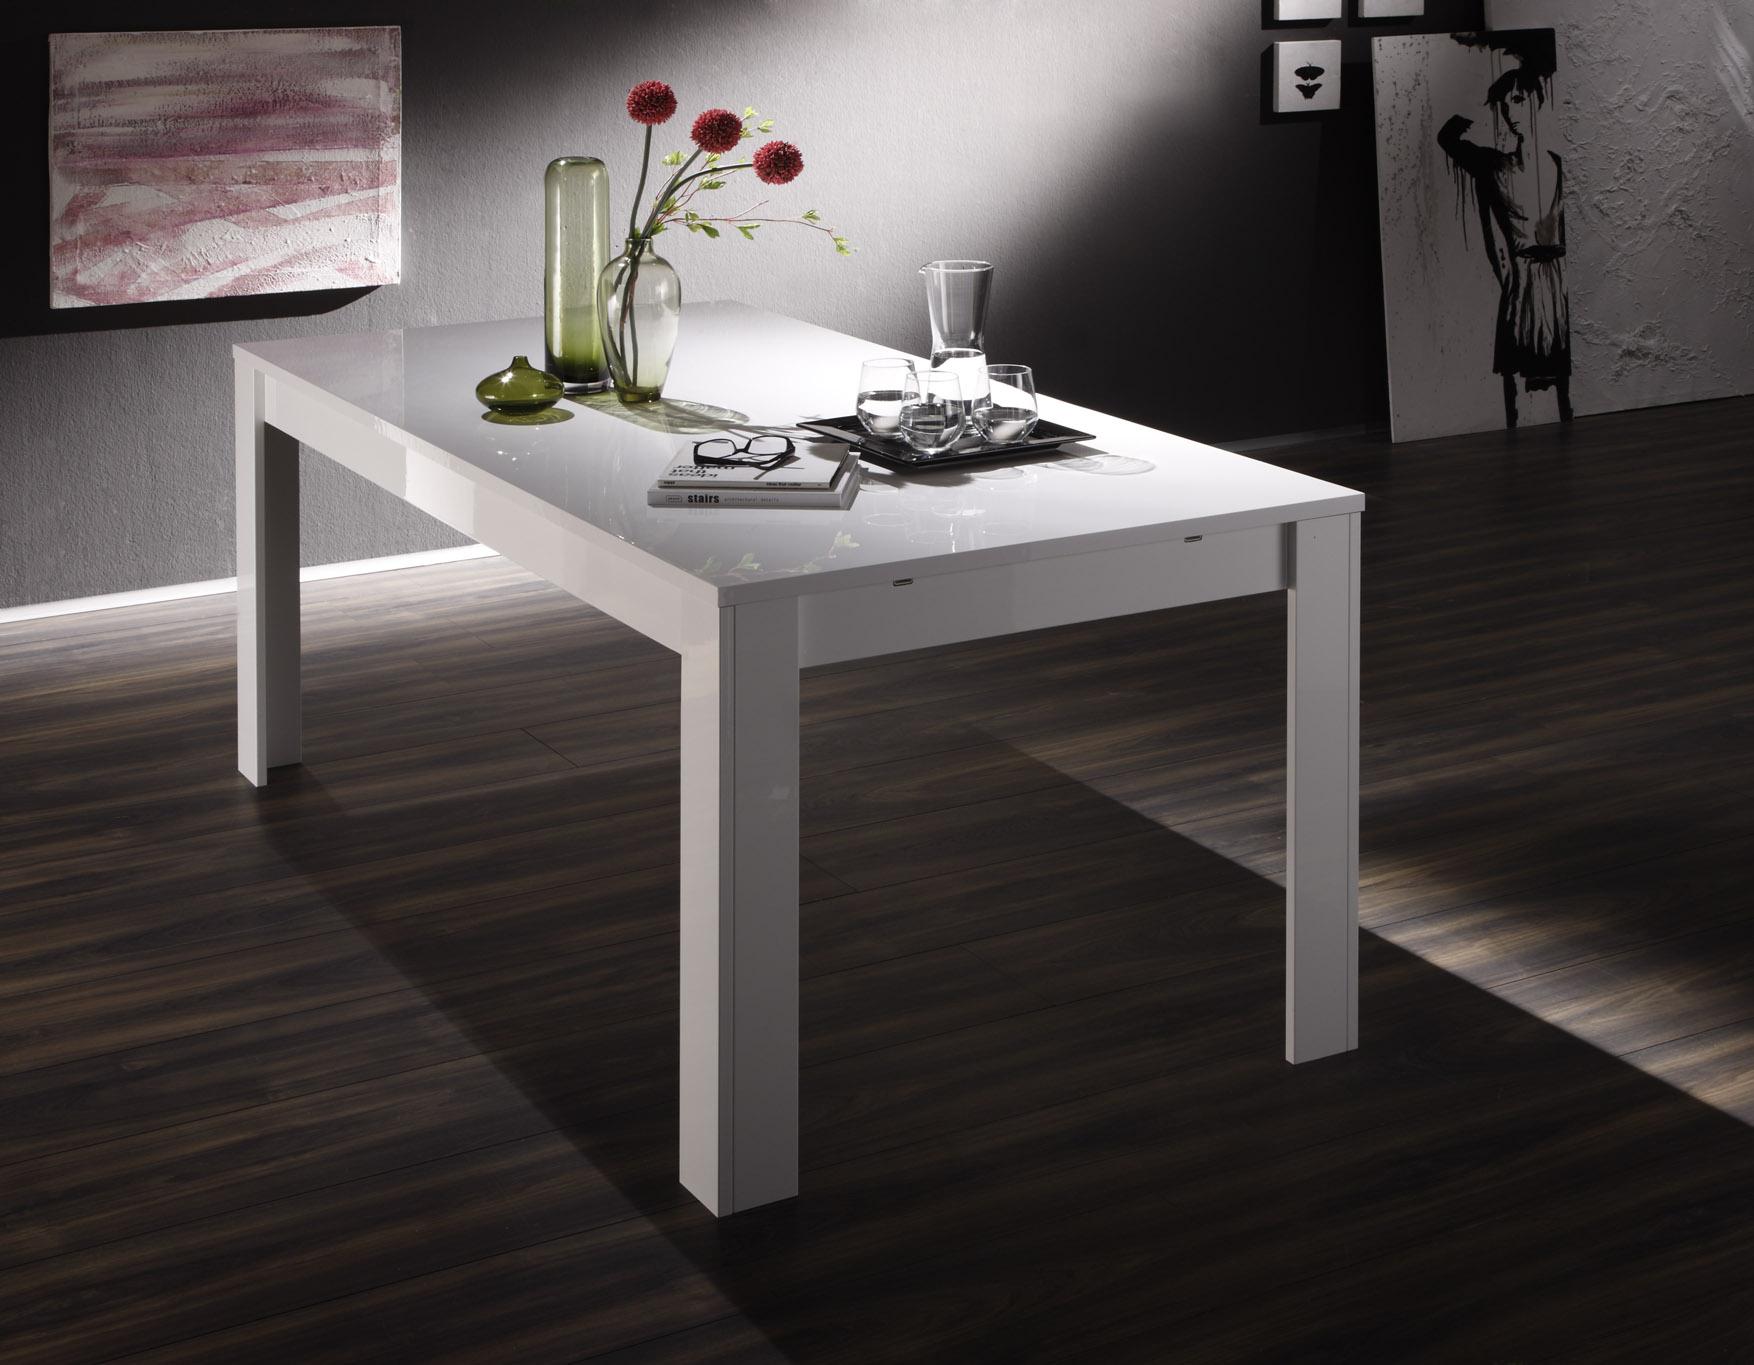 Table de salle manger design laqu blanc judy matelpro - Table salle a manger design blanc laque ...